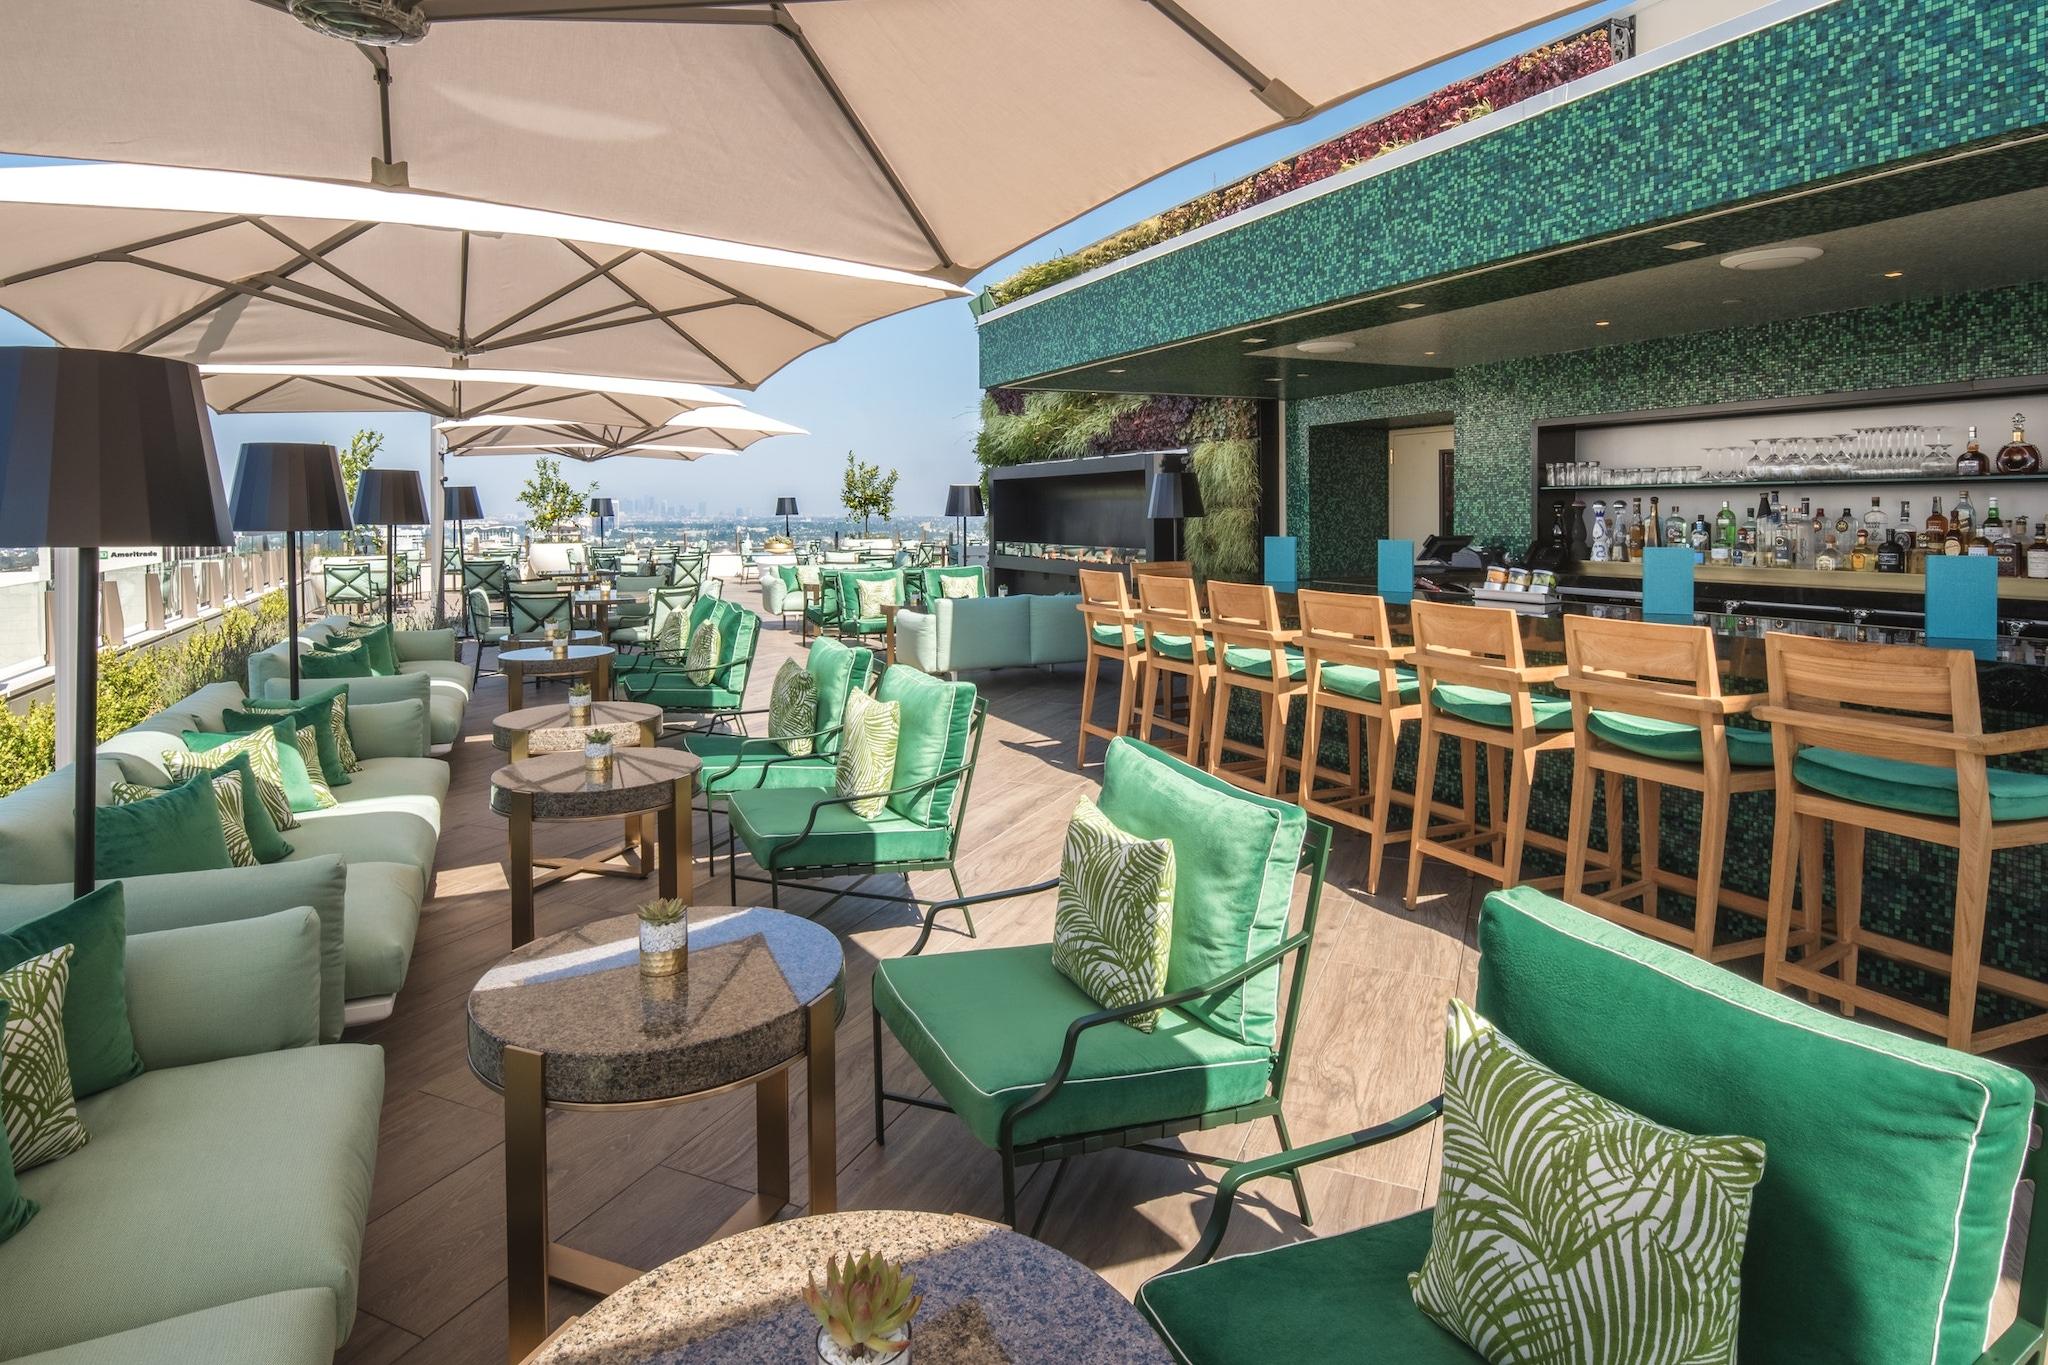 Rooftop by JG, Waldorf Astoria Beverly Hills